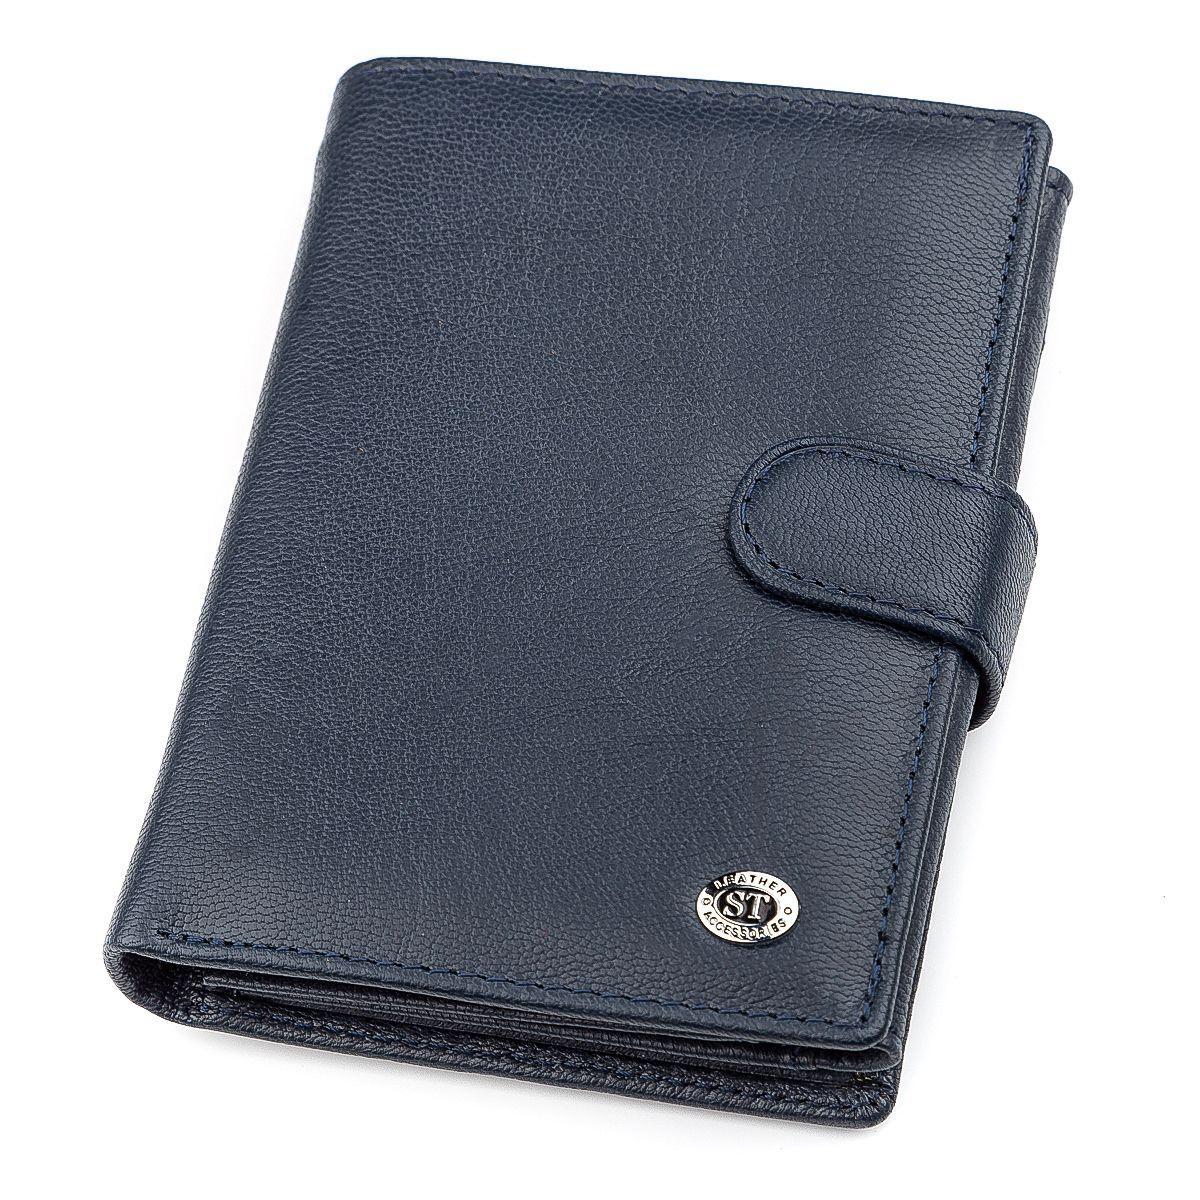 Мужской кошелек ST Leather 18332 (ST101) кожа Синий